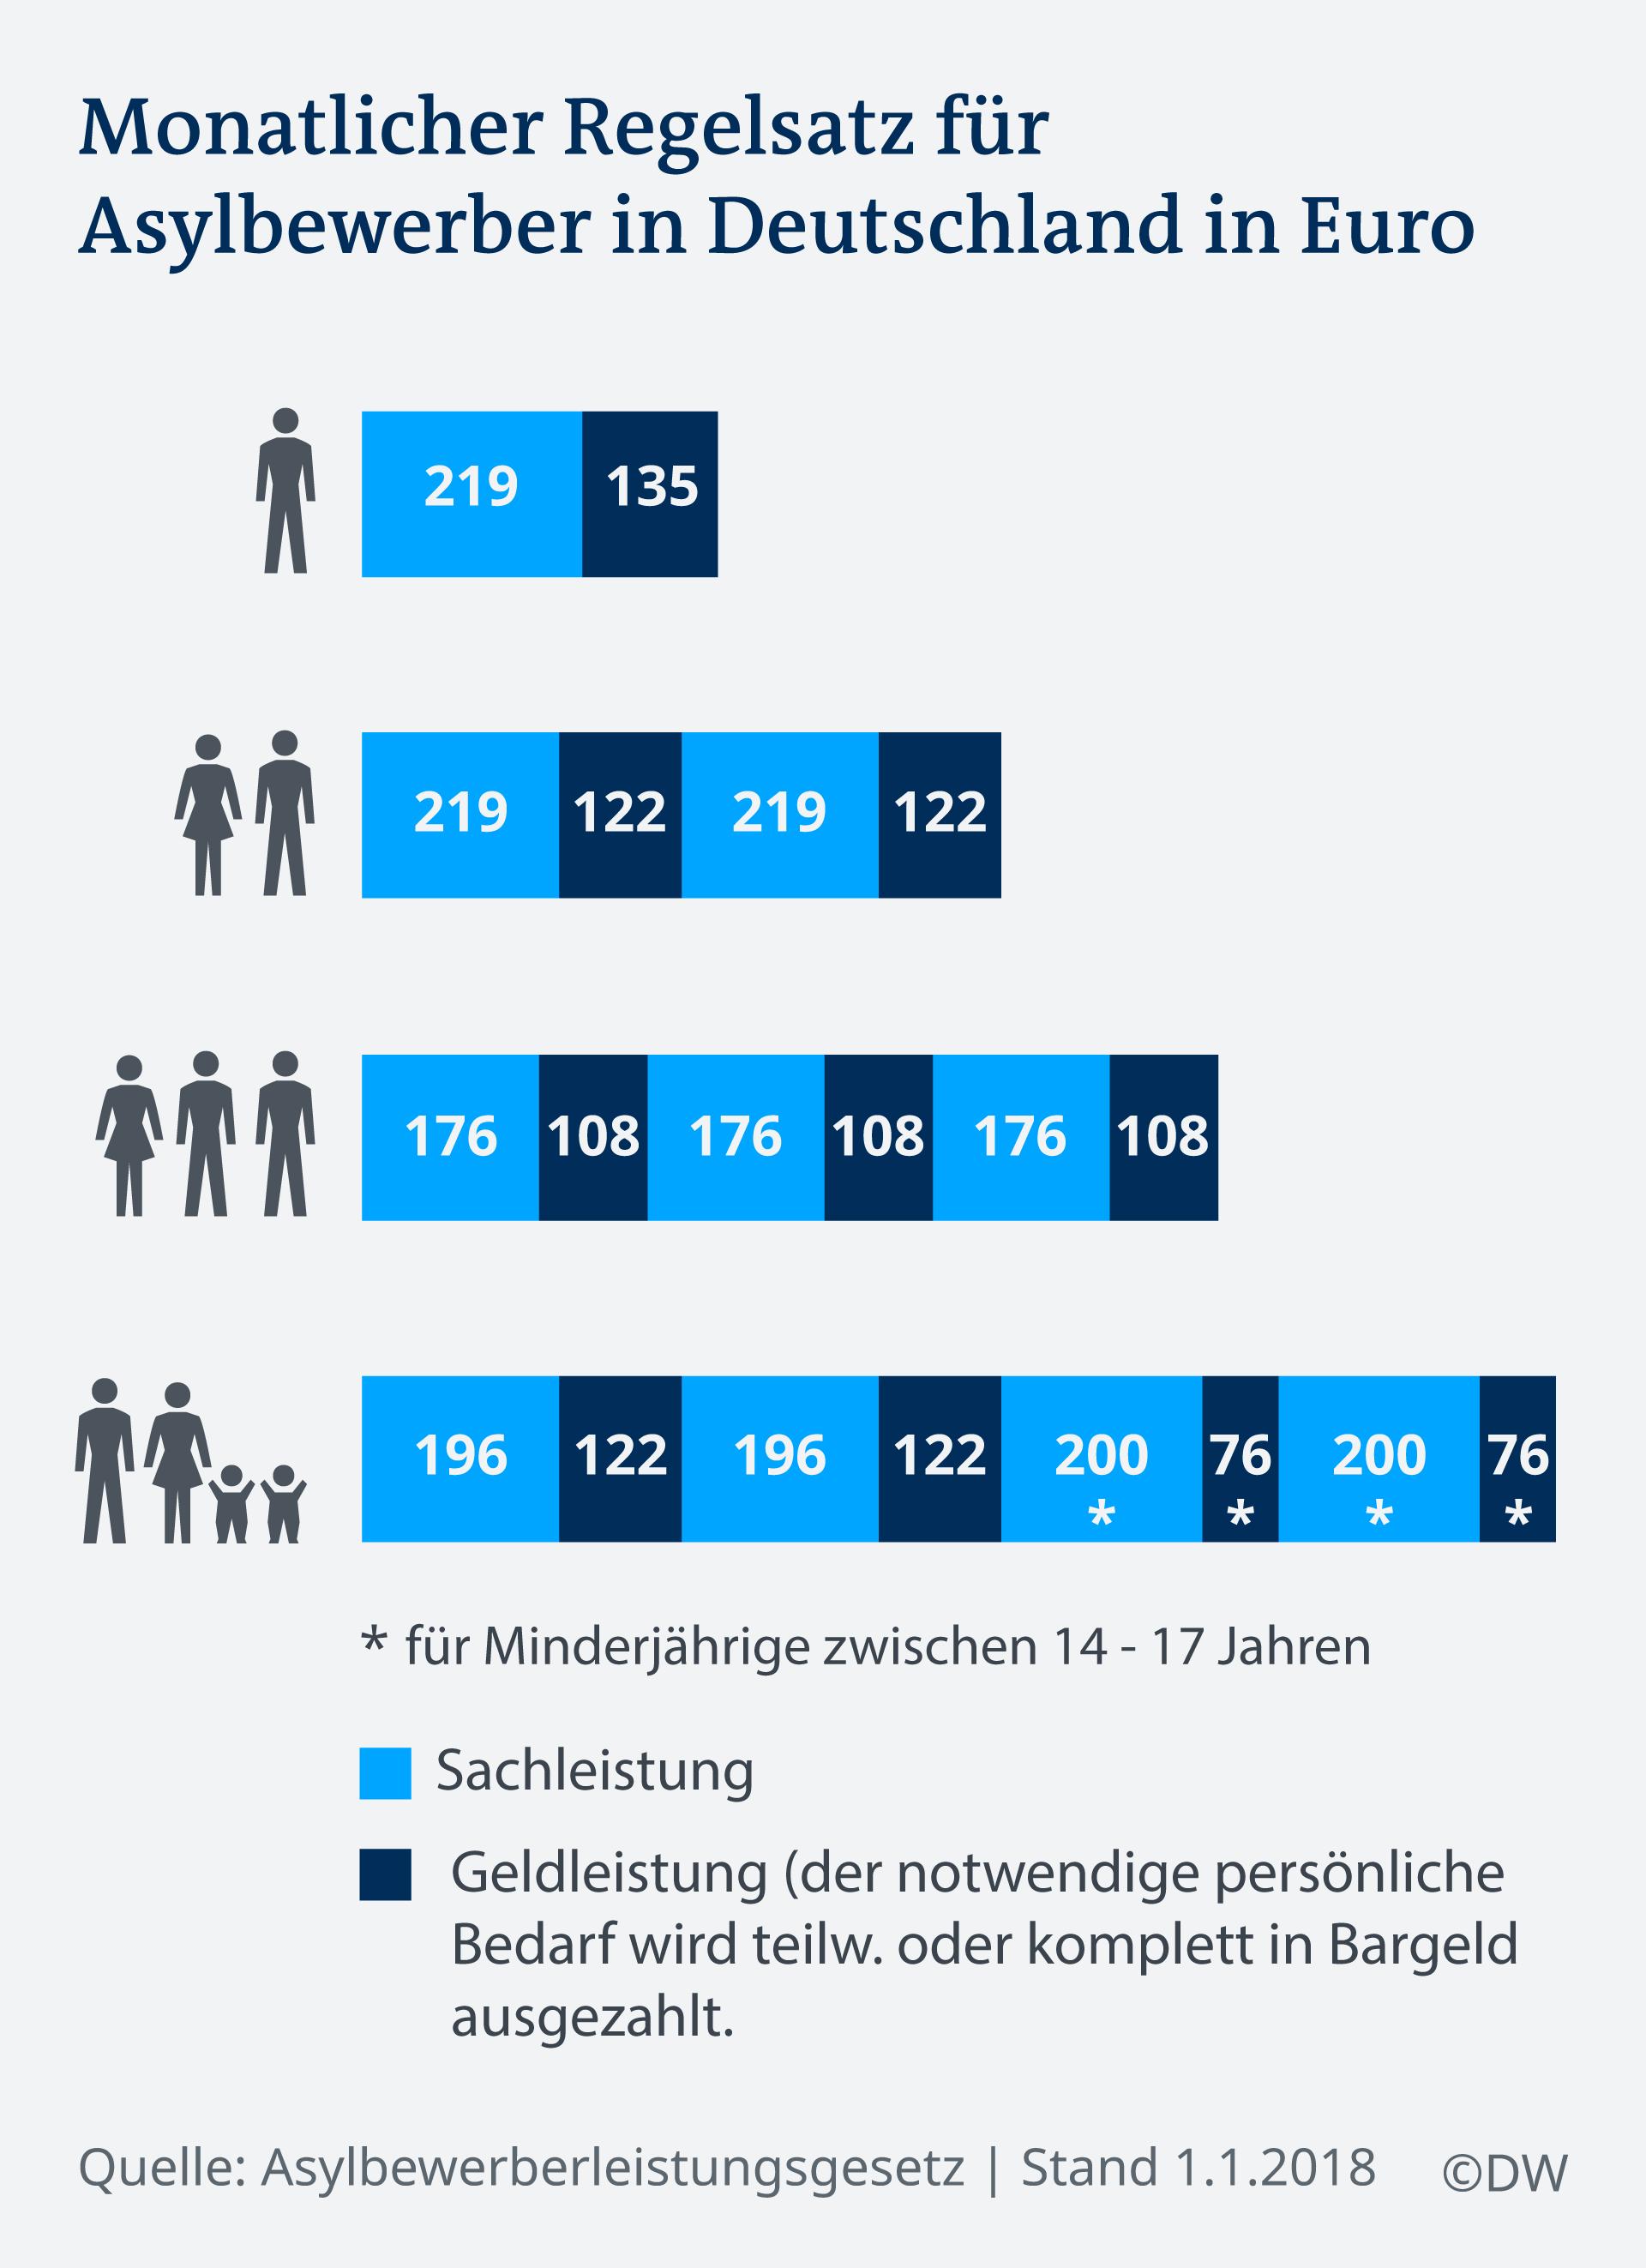 lebensunterhaltskosten pro person im monat